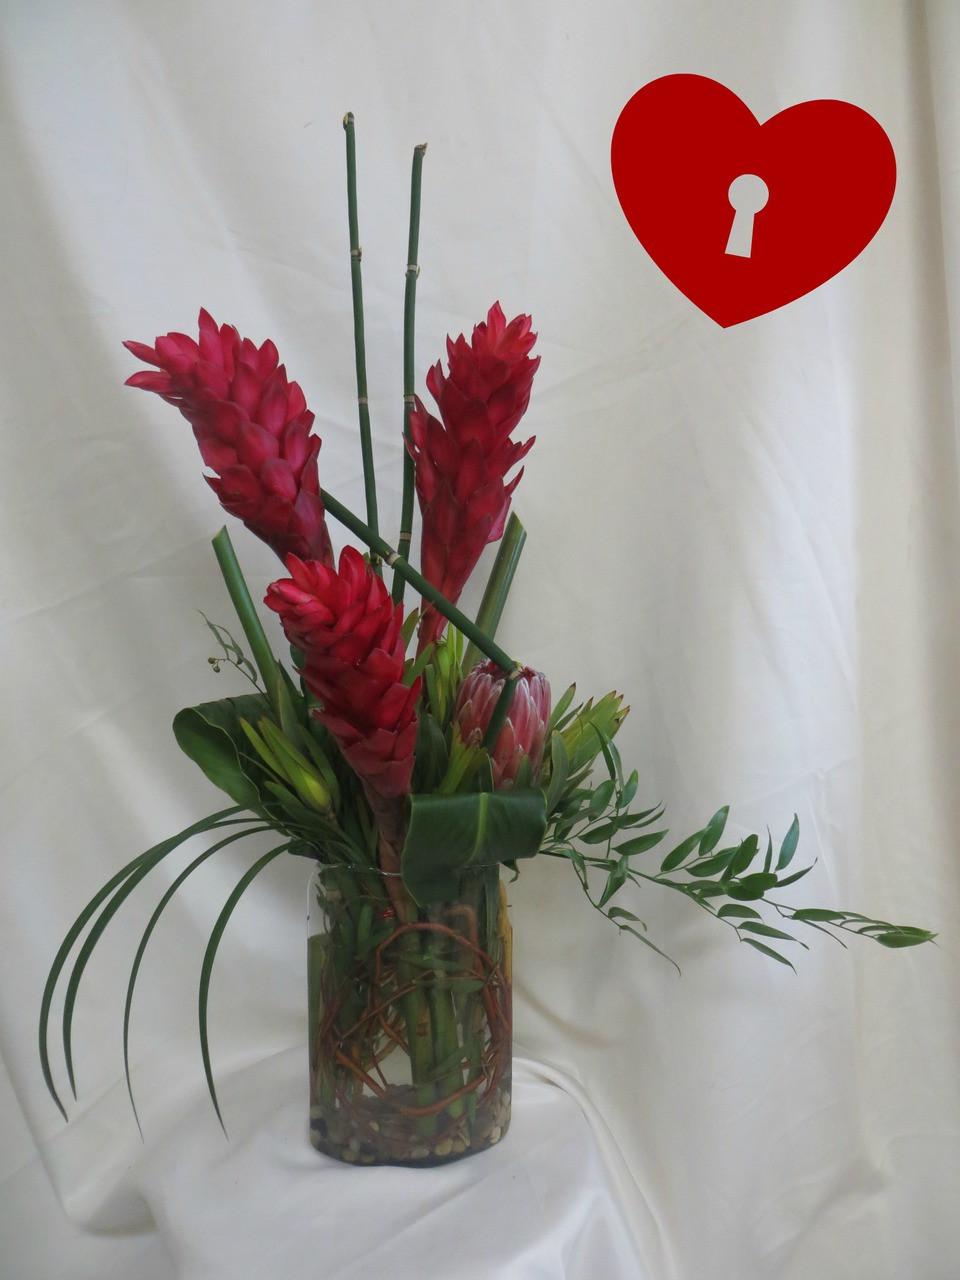 Red Hot Ginger Bouquet Valentines Day Flower Arrangements